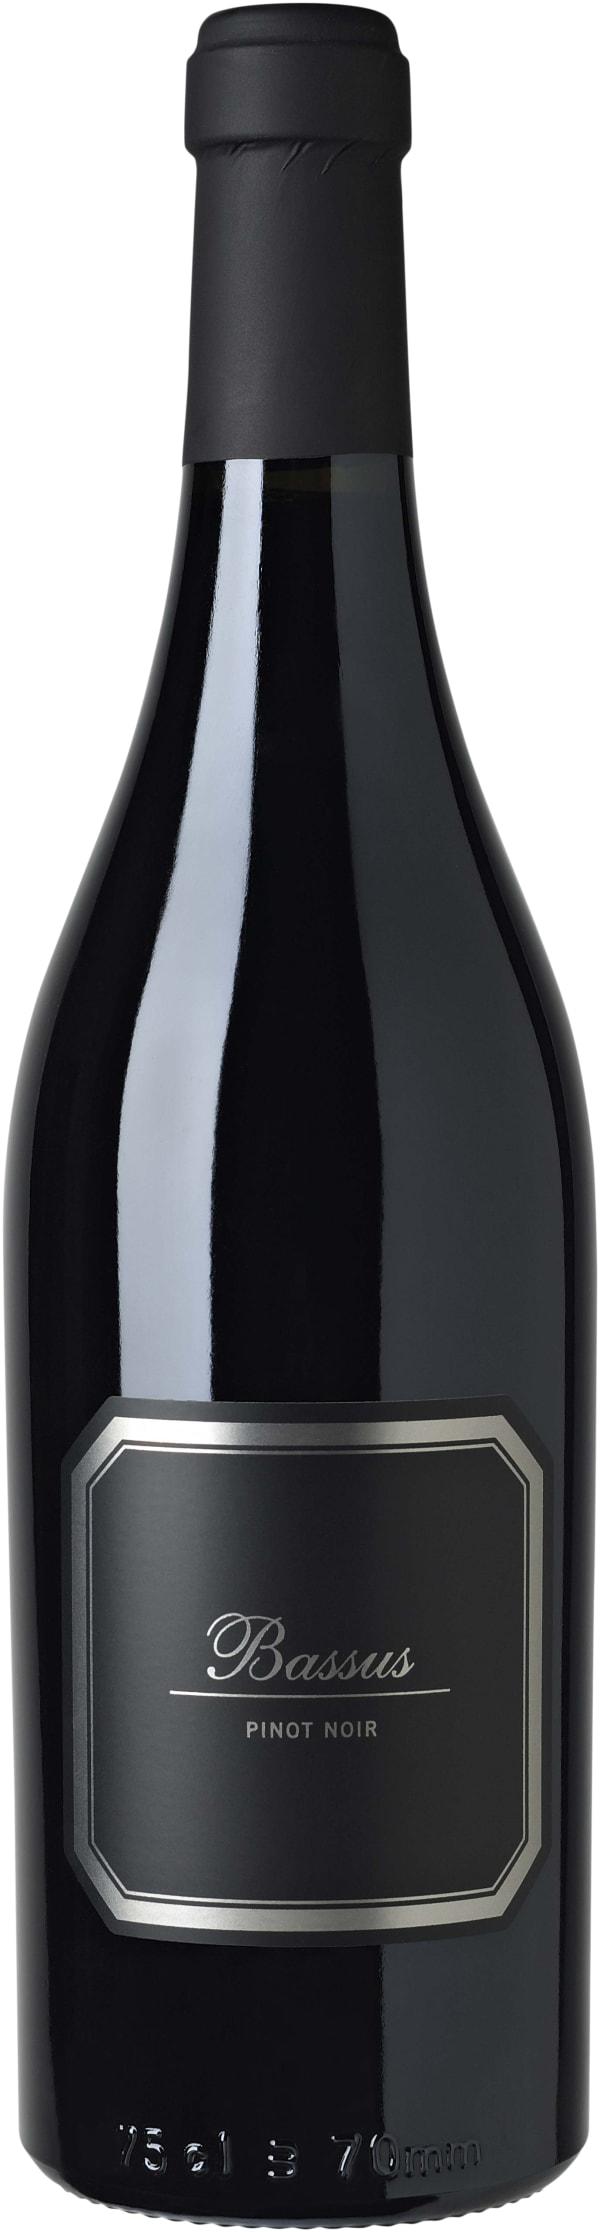 Hispano+Suizas Bassus Pinot Noir 2015